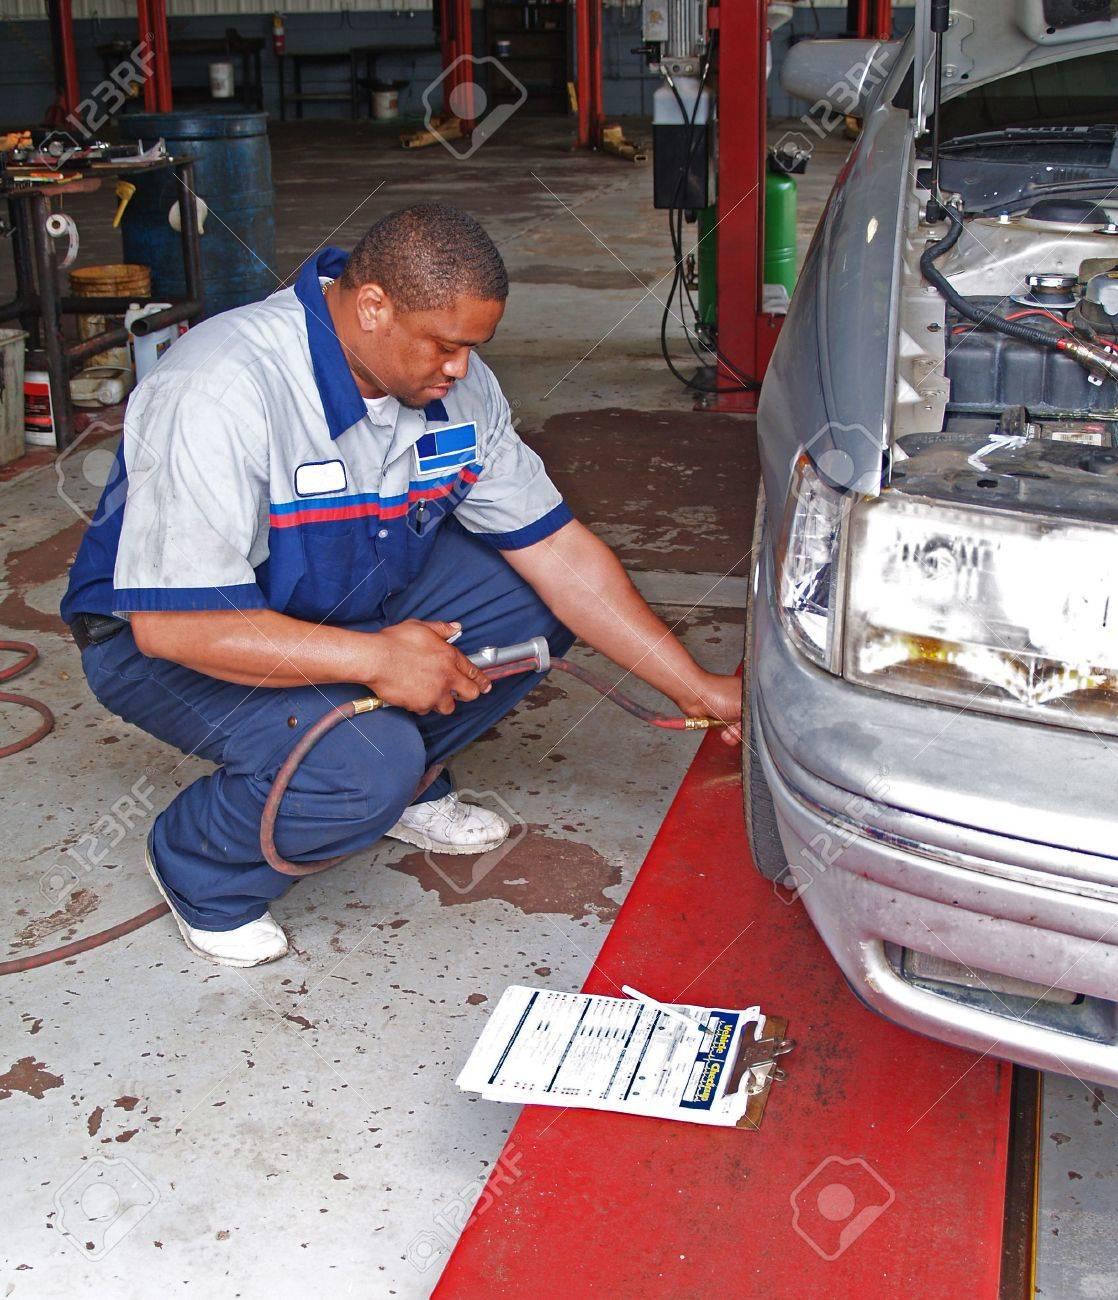 Auto mechanic inspecting a car's tire pressure in a service garage. - 7442809